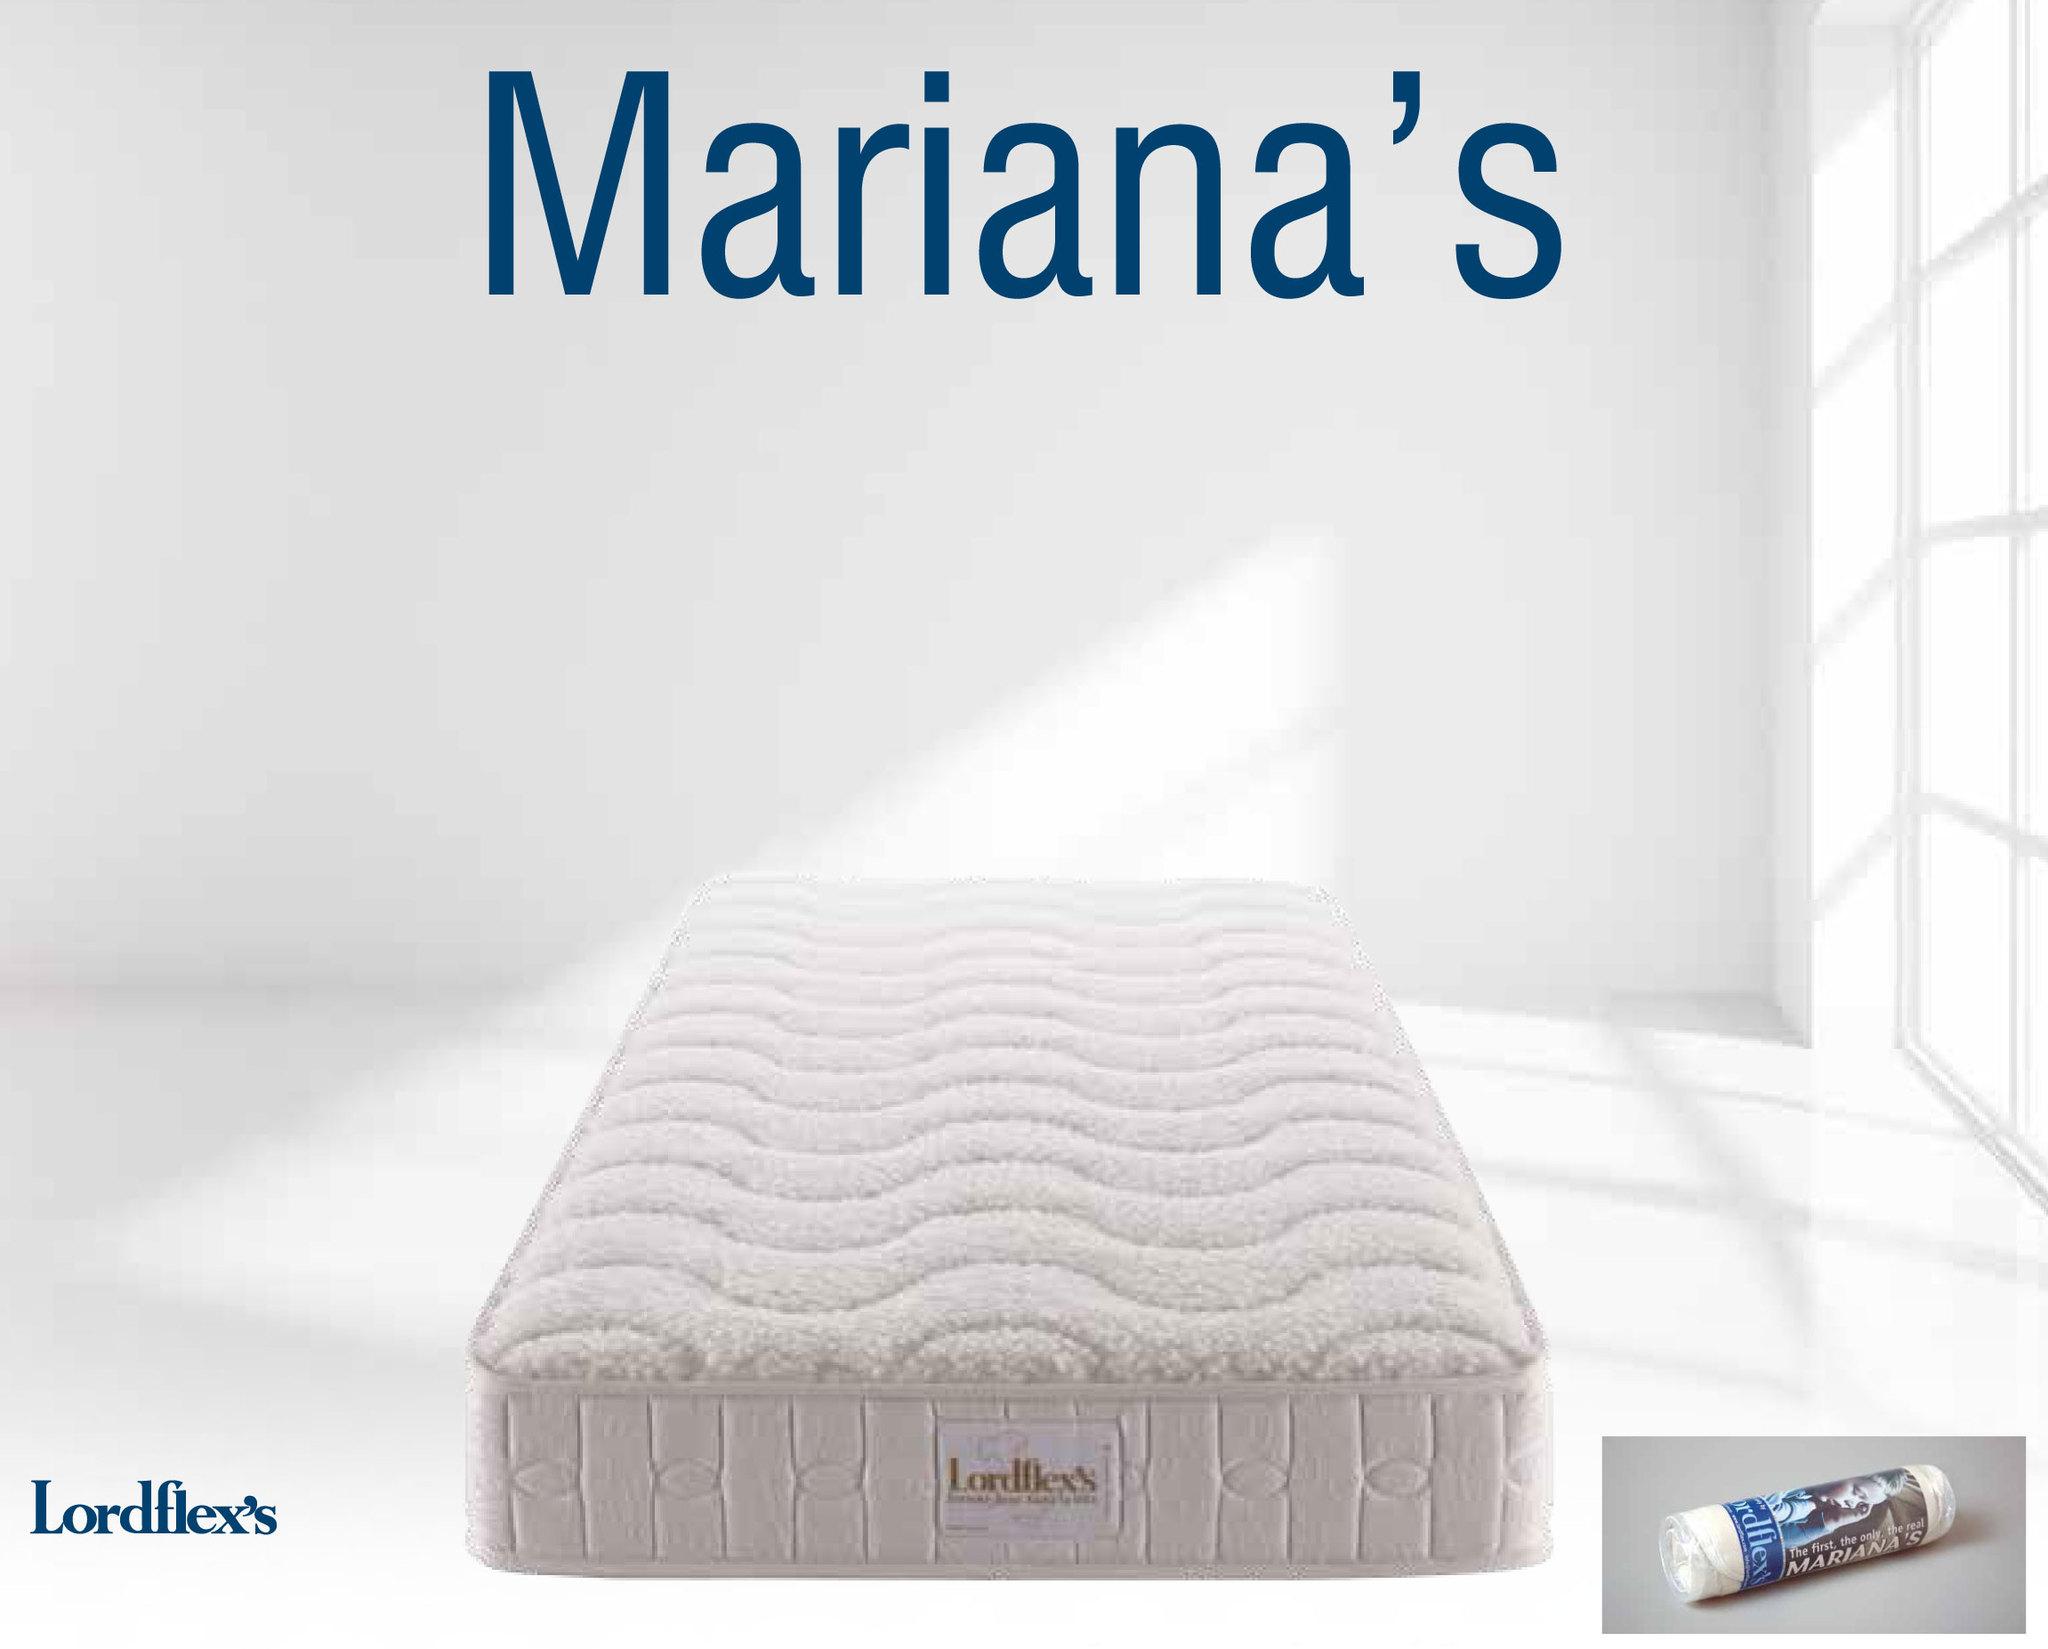 Матрасы Матрас ортопедический Lordflex's Mariana's 90х200 до 140 кг 1_Mariana_s.jpg